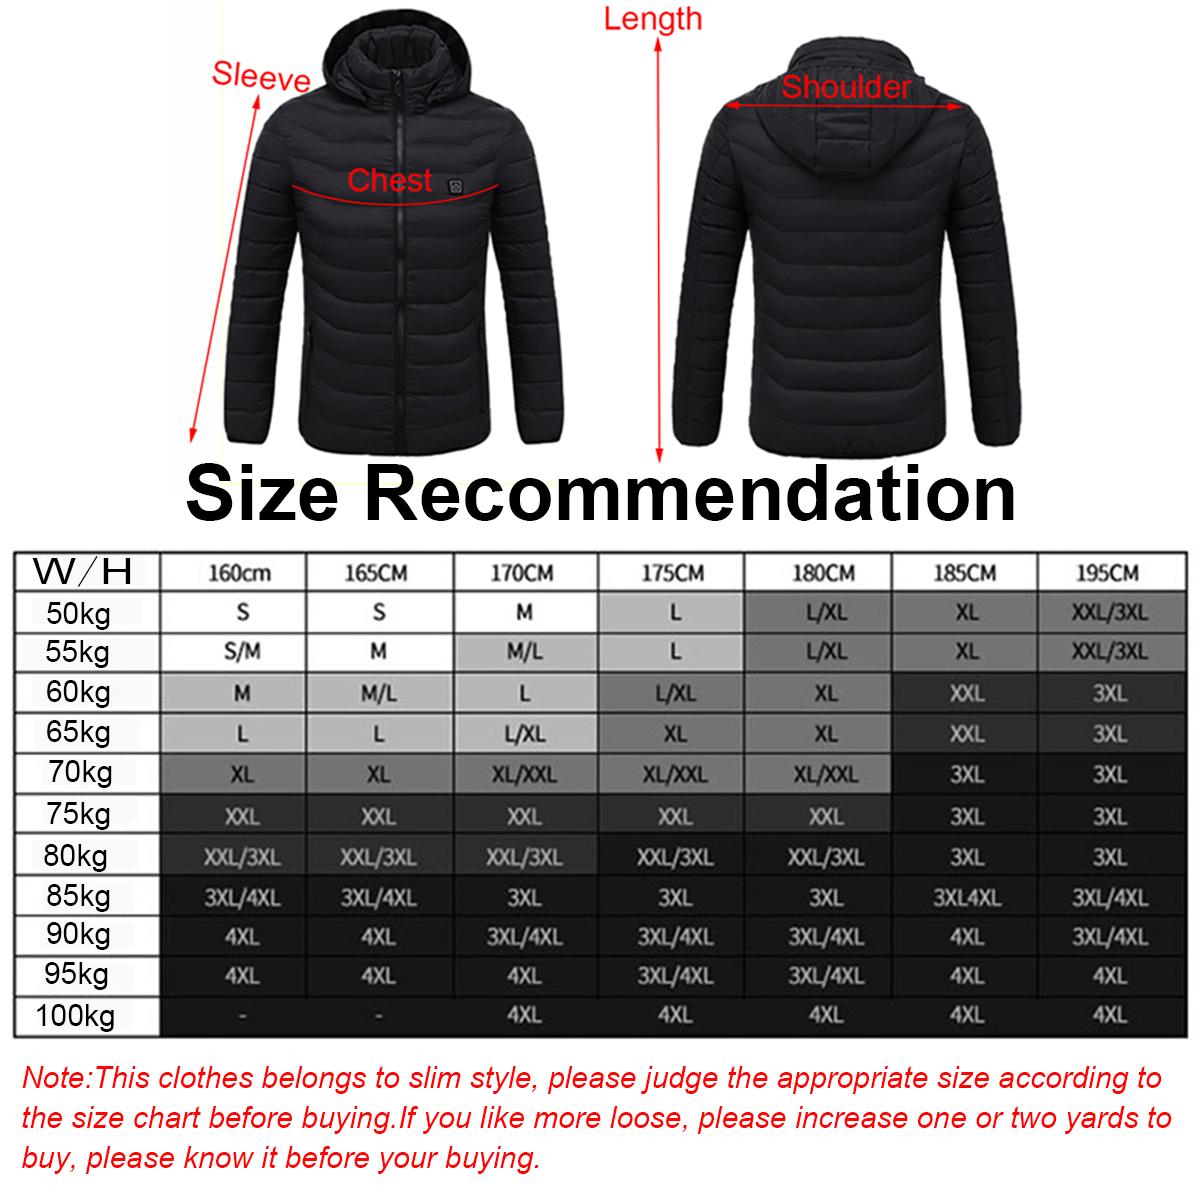 Electric Heating USB Abdomen Back Intelligent Winter Hooded Heated Coat Jacket Temperature Control